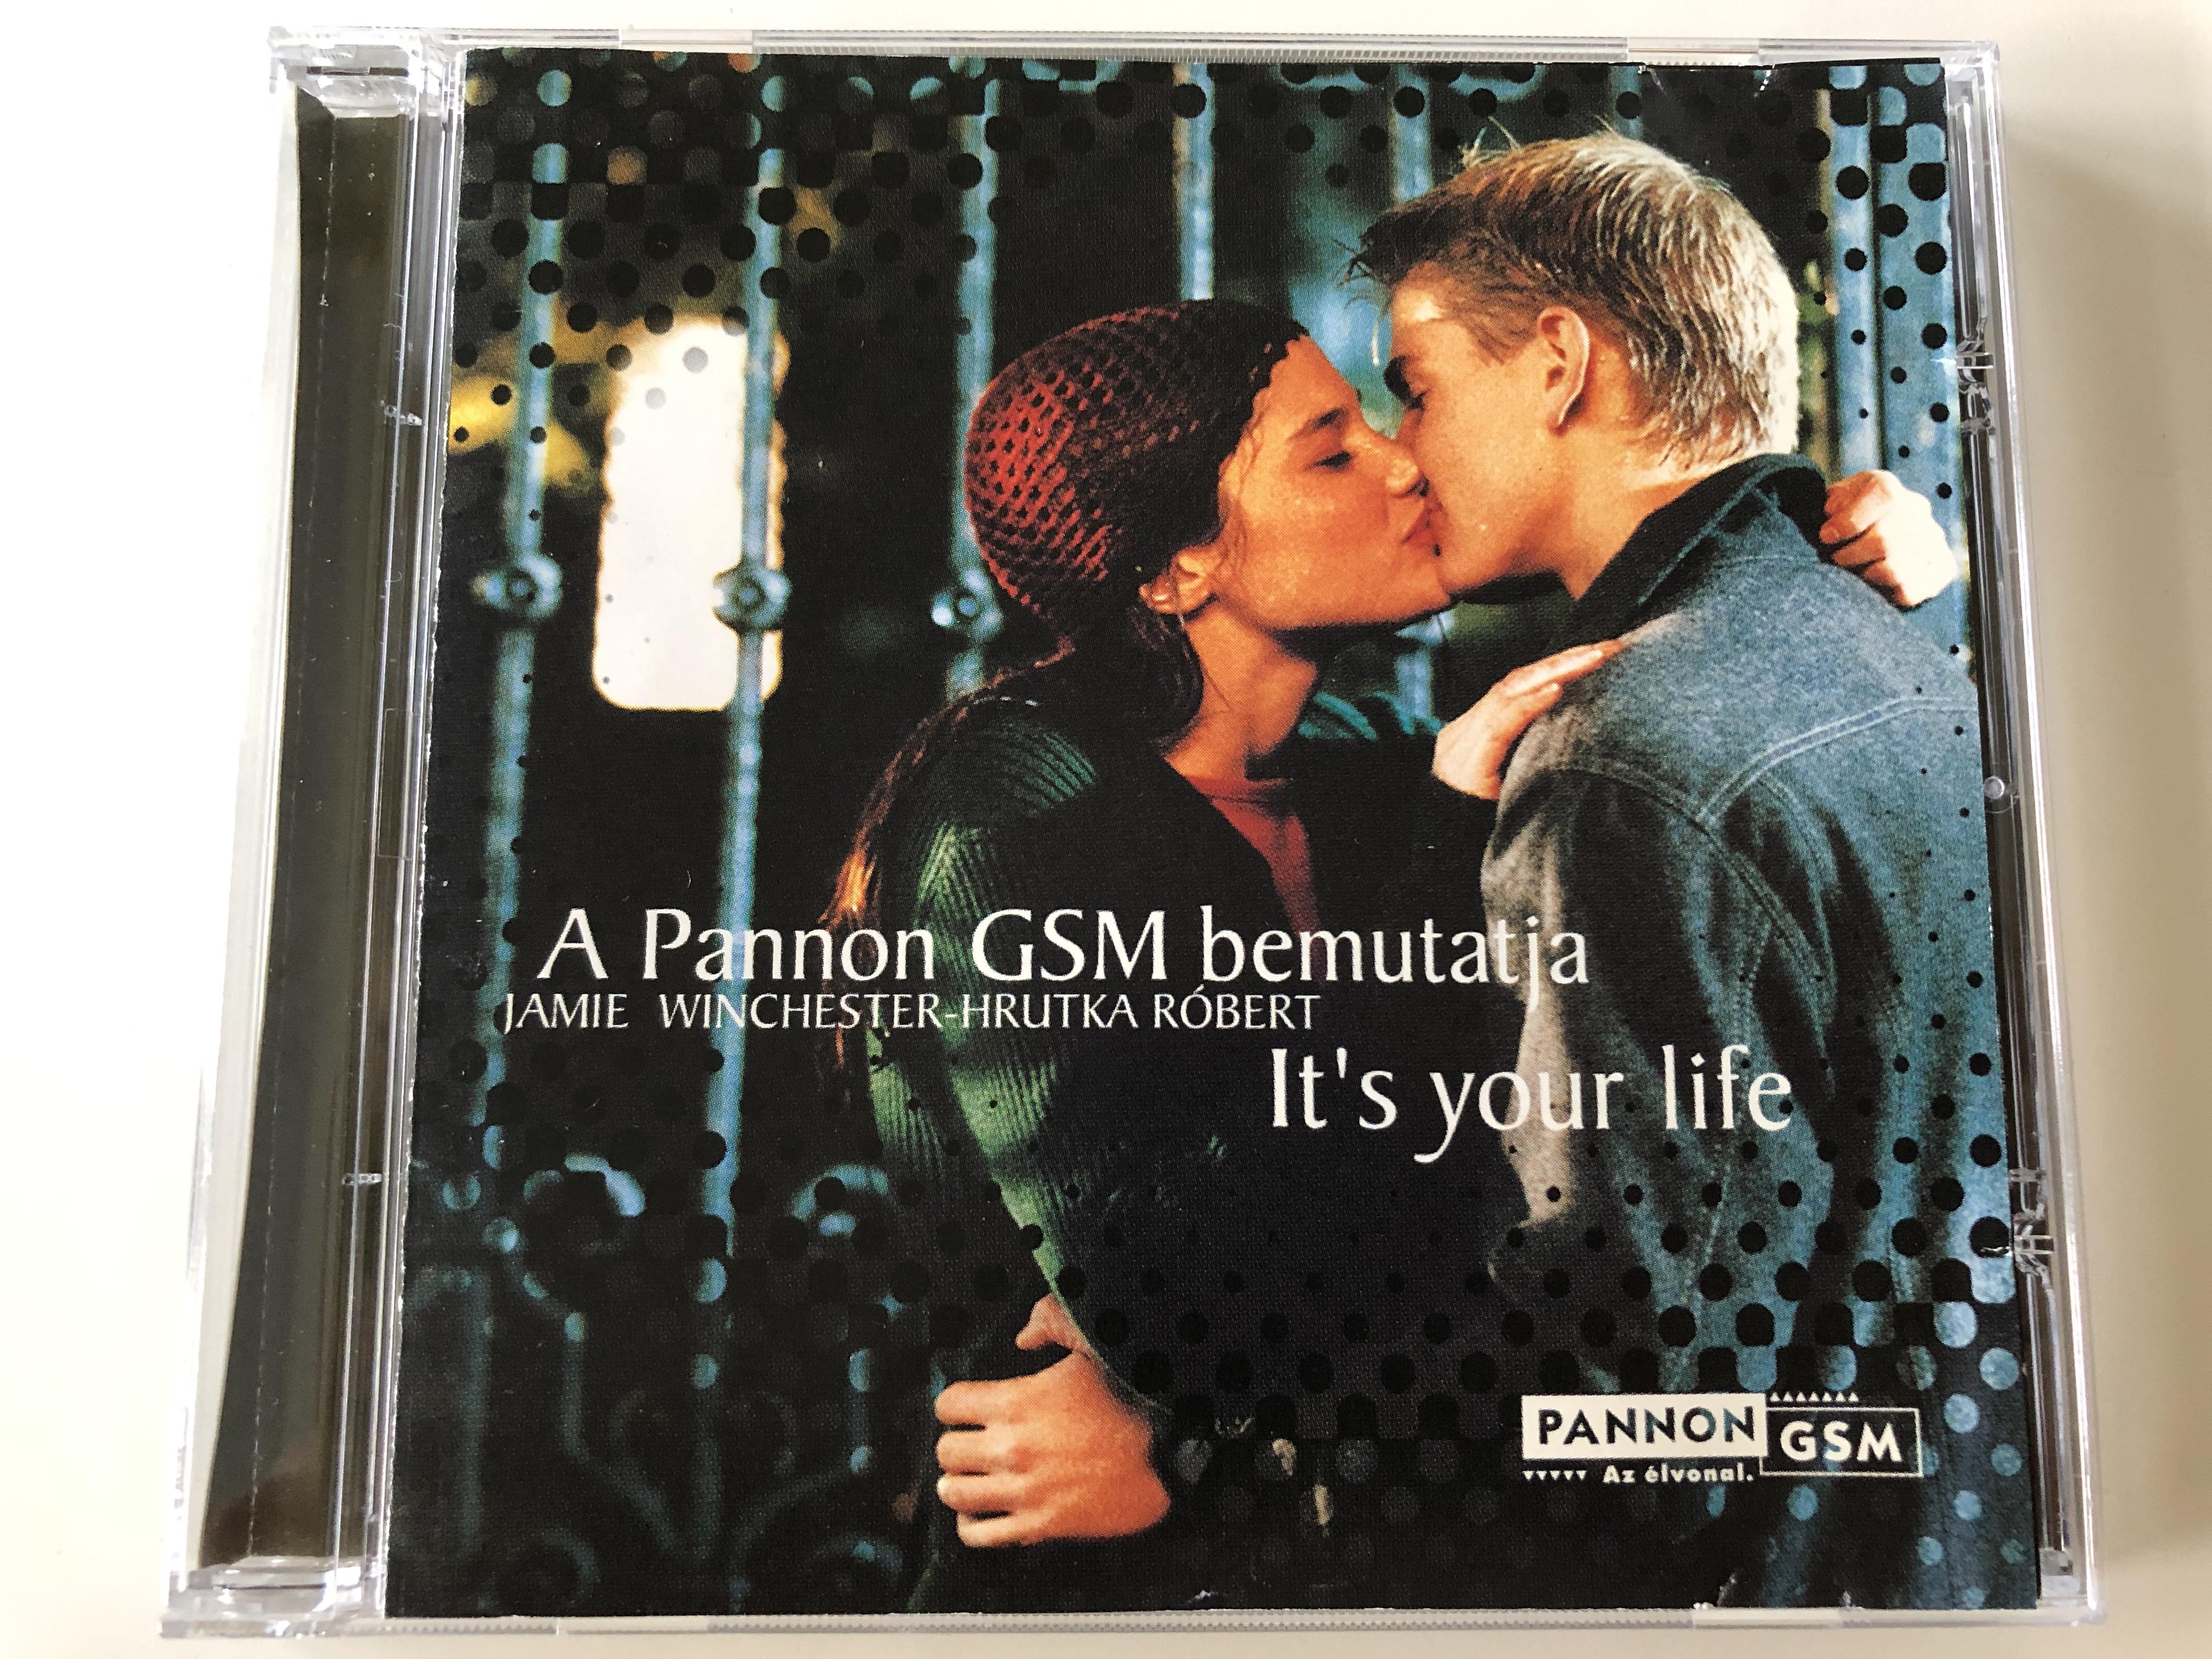 a-pannon-gsm-bemutatia-jamie-winchester-hrutka-r-bert-it-s-your-life-tom-tom-records-audio-cd-2001-2001-ttcd-08-1-.jpg